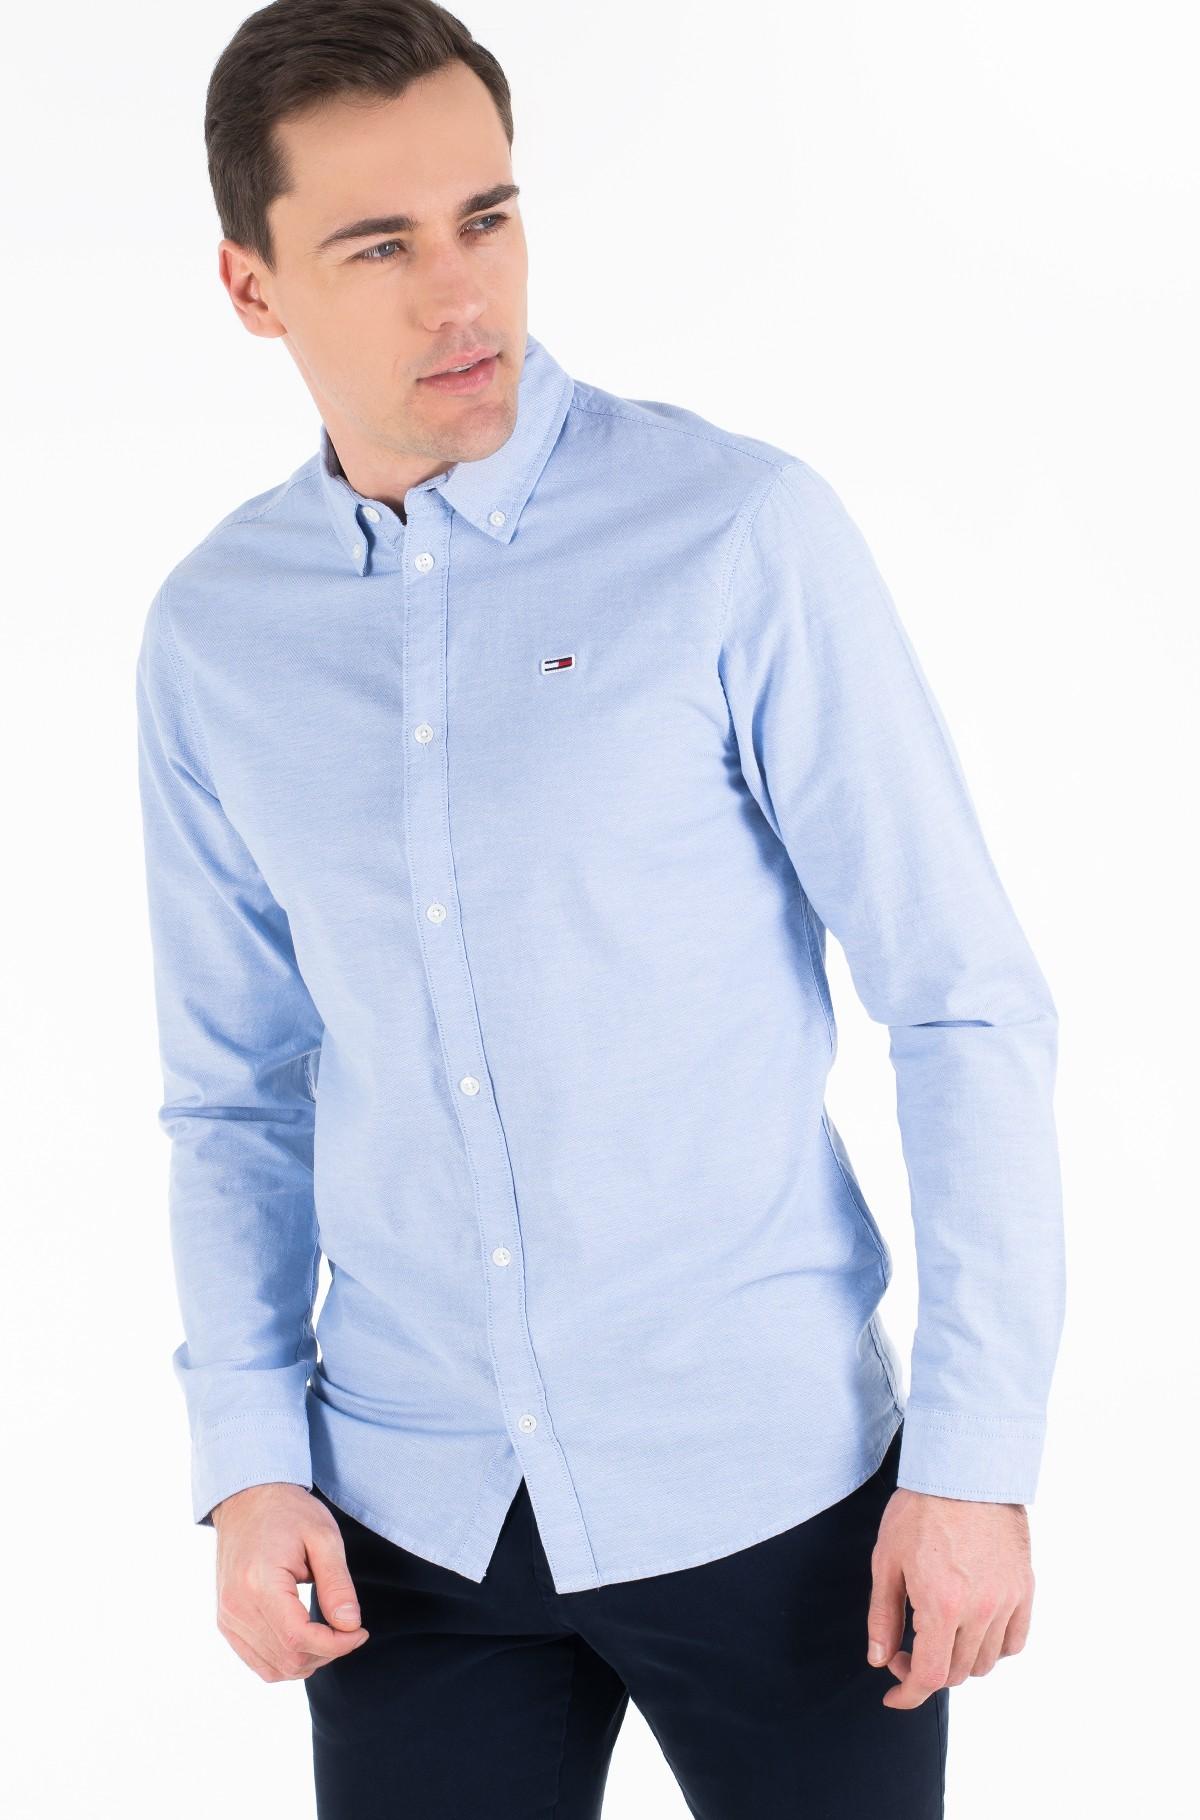 Marškiniai TJM STRETCH OXFORD SHIRT-full-1